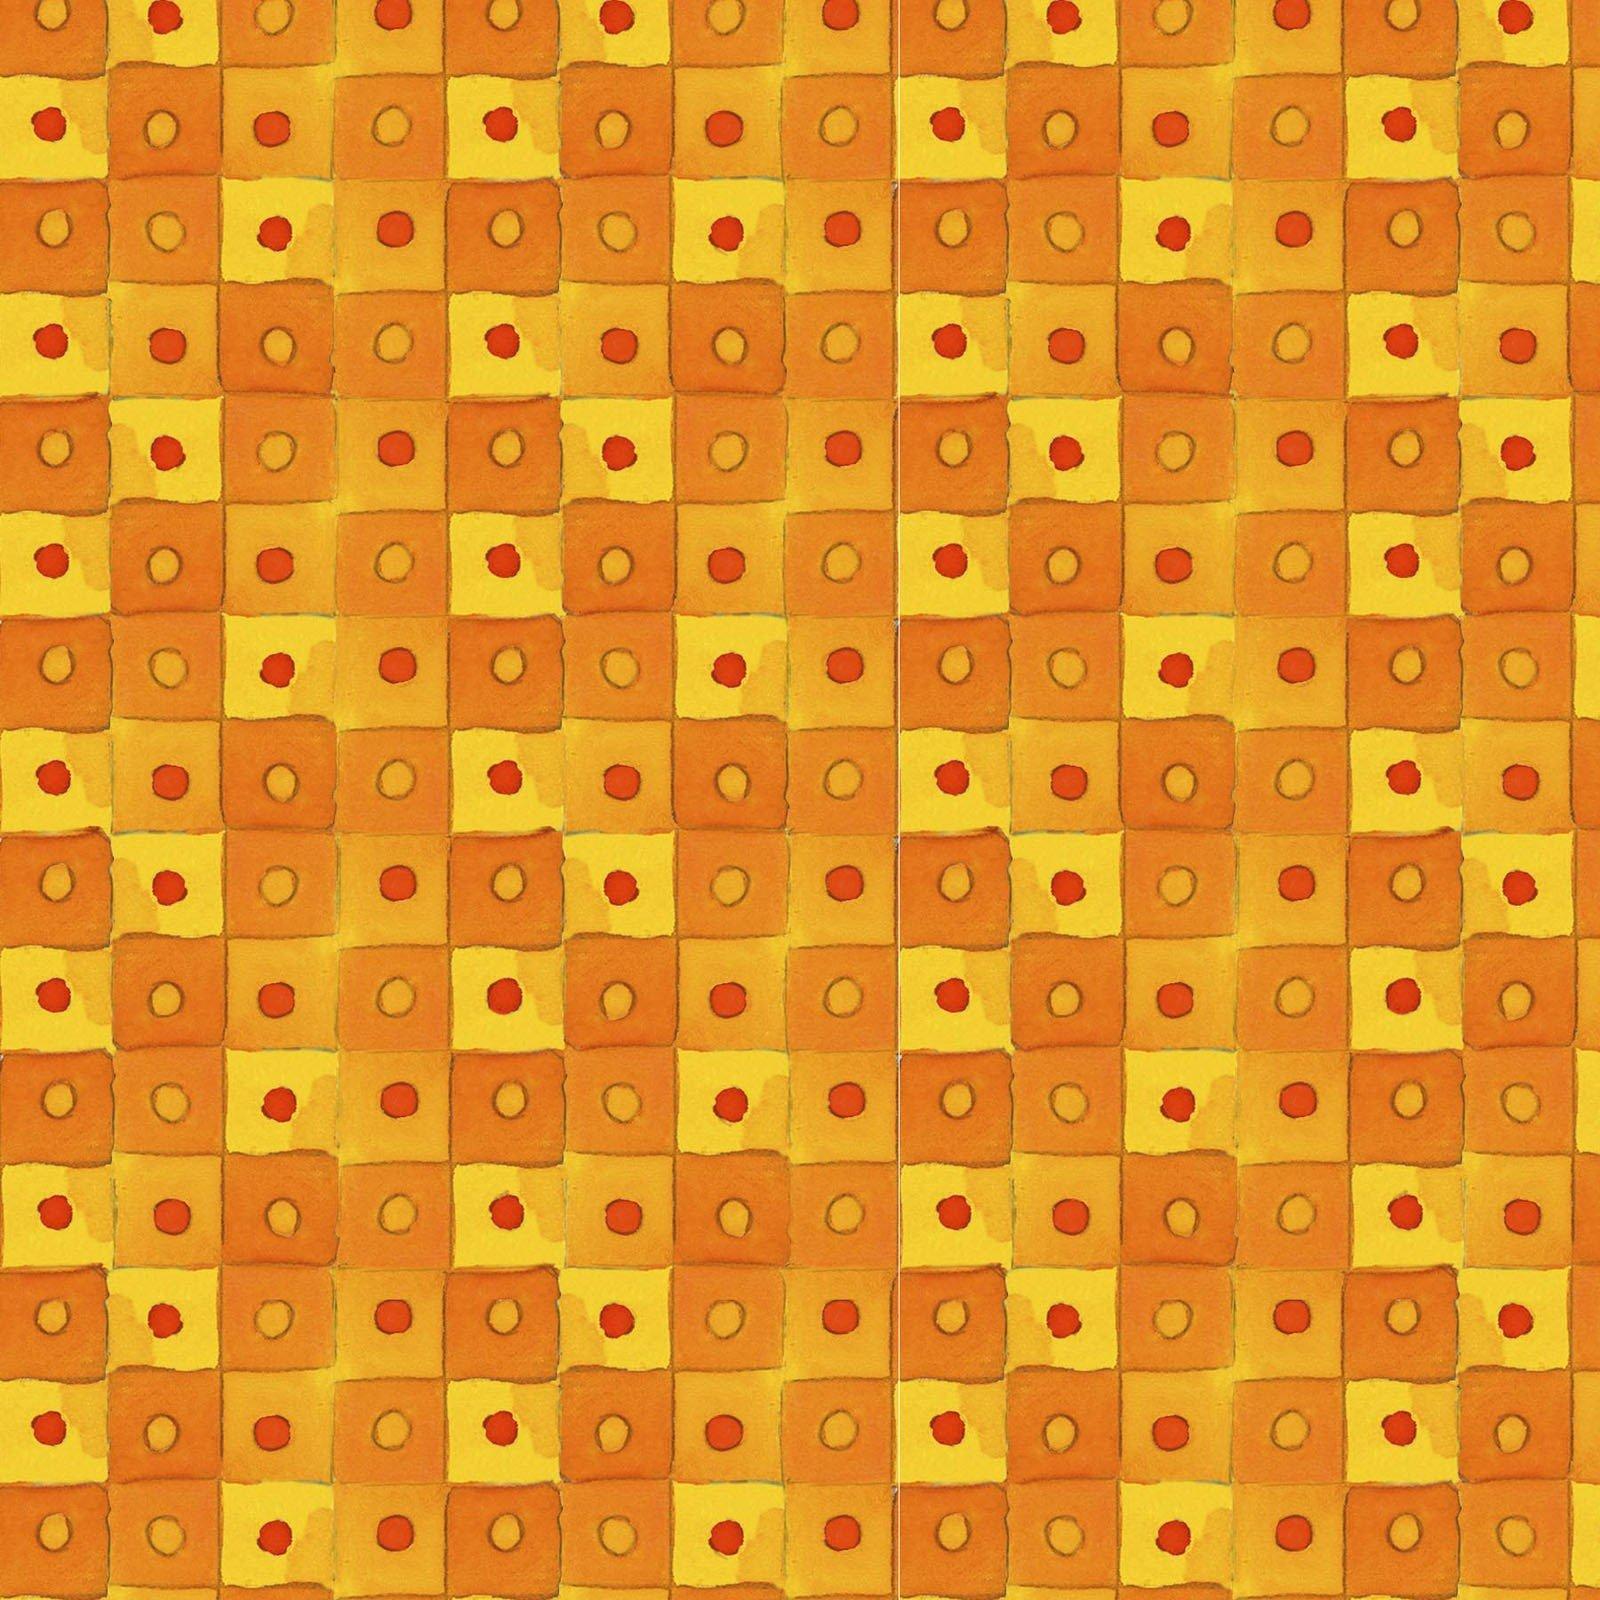 Orange Checkerboard - Masquica by Kathleen Deggendorfer - MASD9204-O